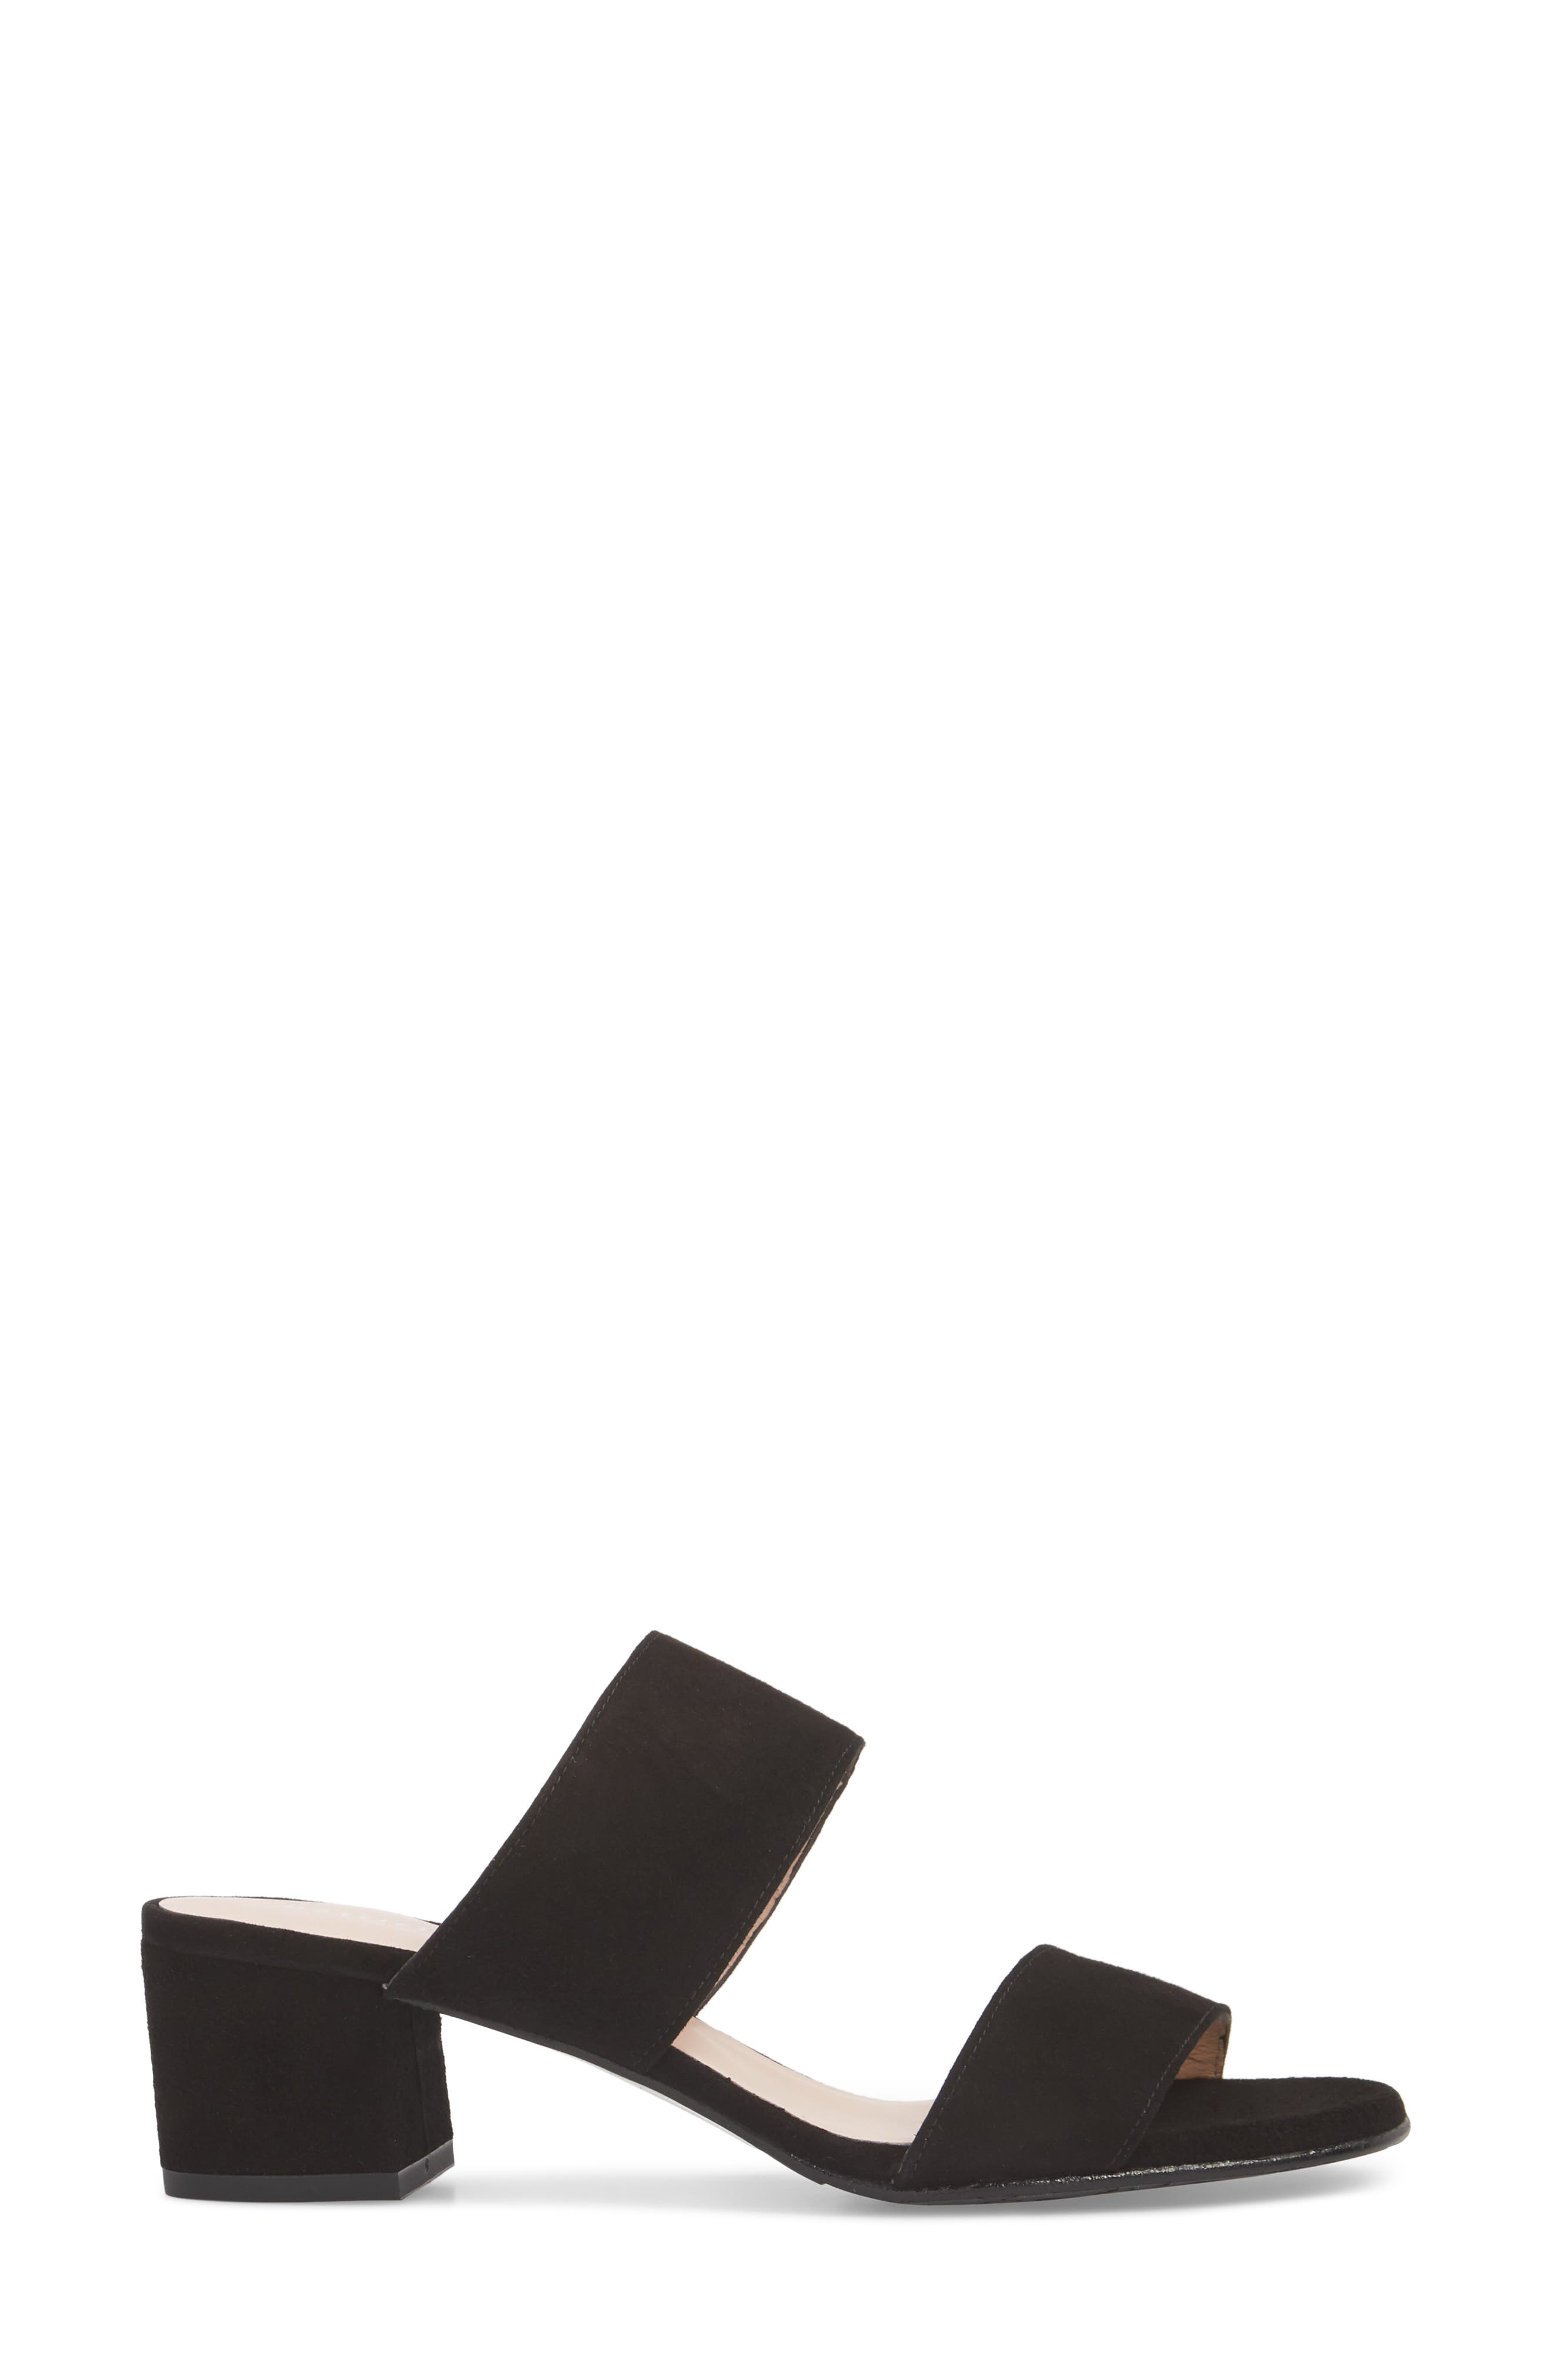 Lola Slide Sandal,                             Alternate thumbnail 3, color,                             Black Suede